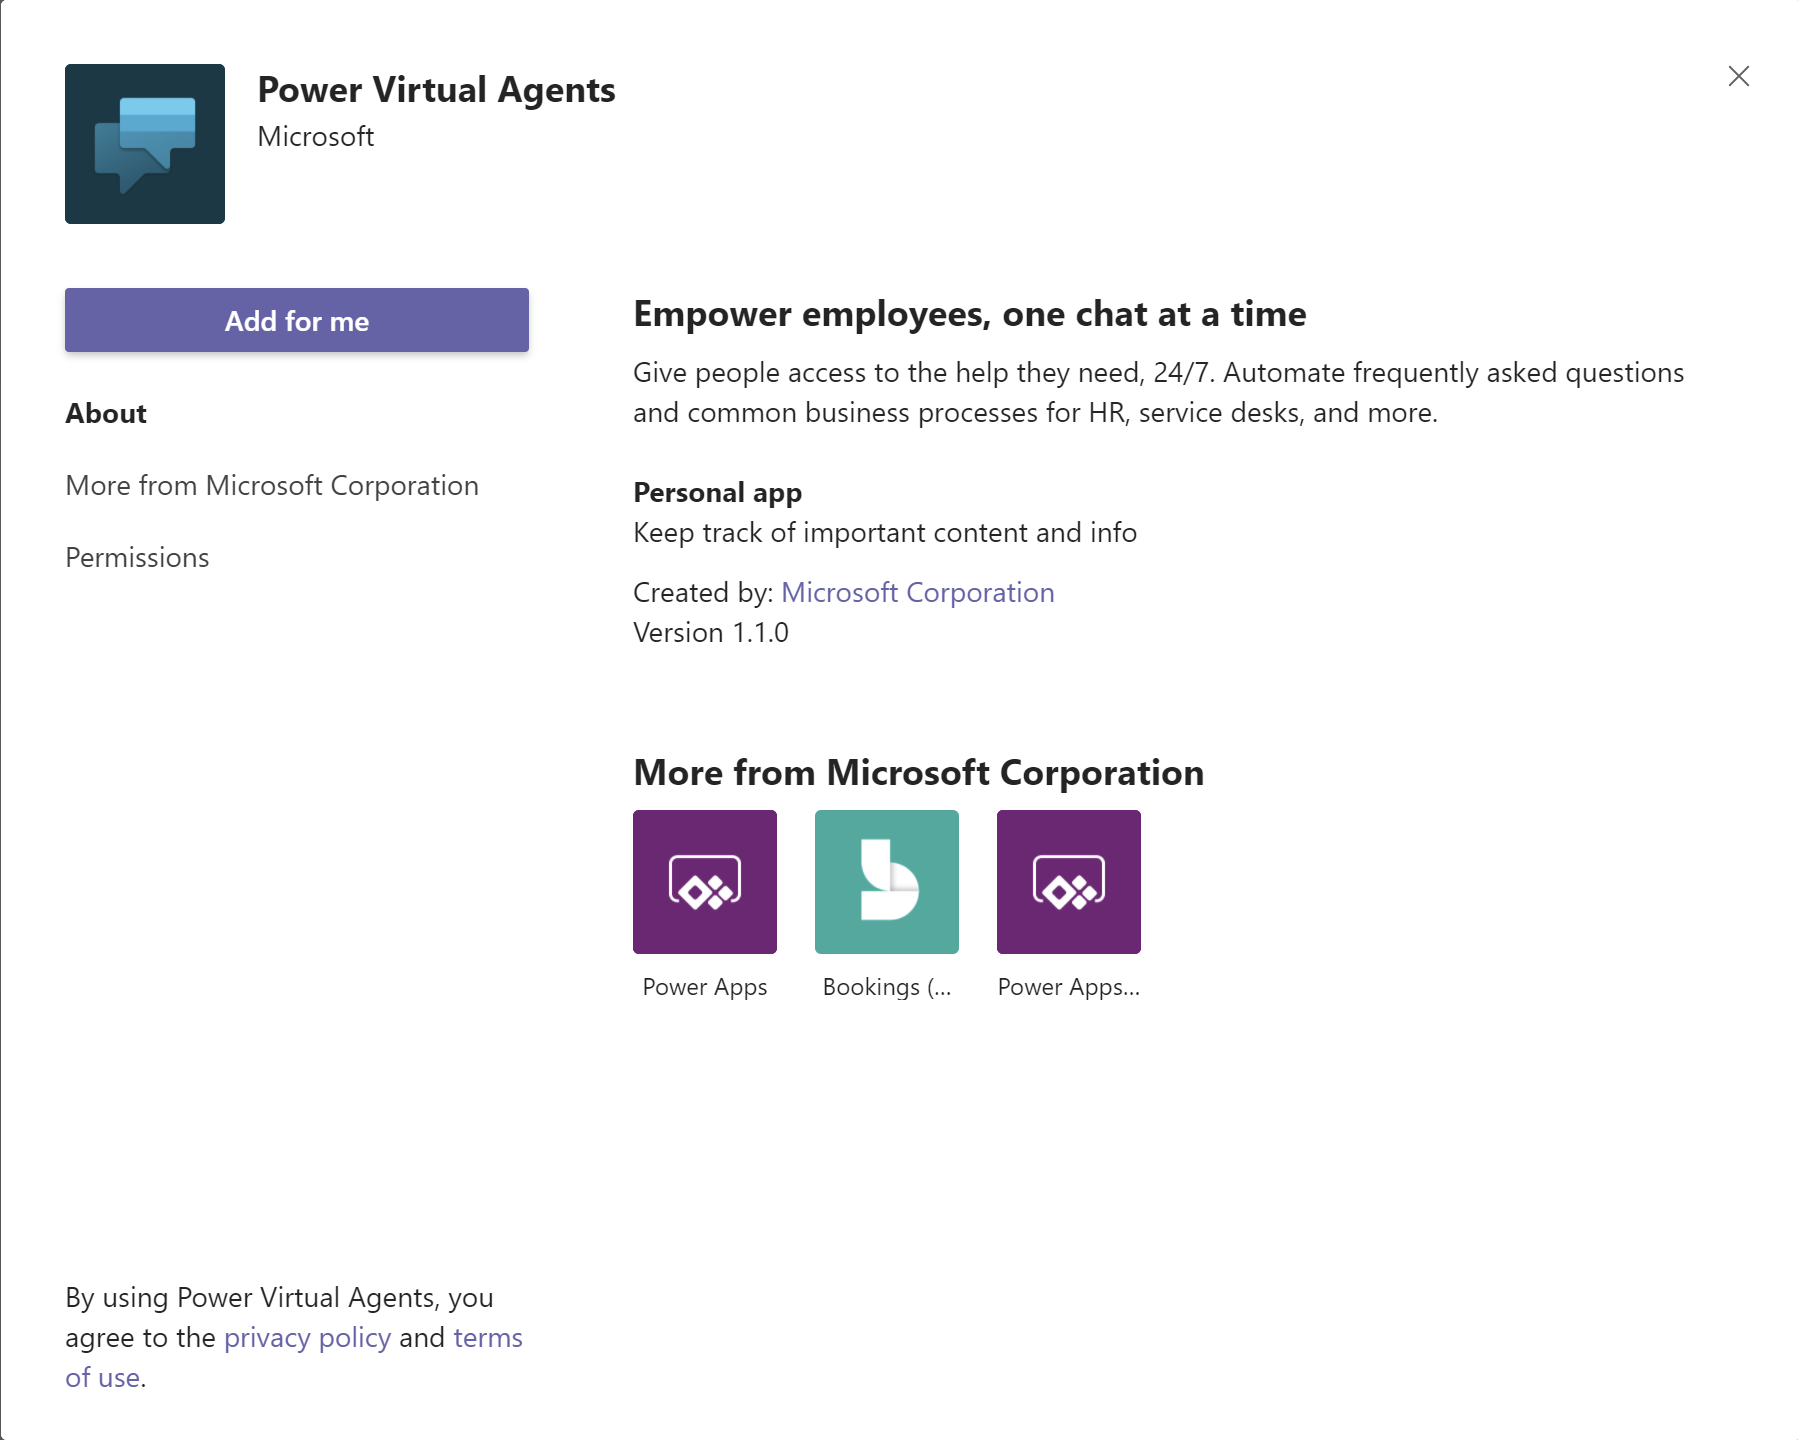 Add the Power Virtual Agents app.